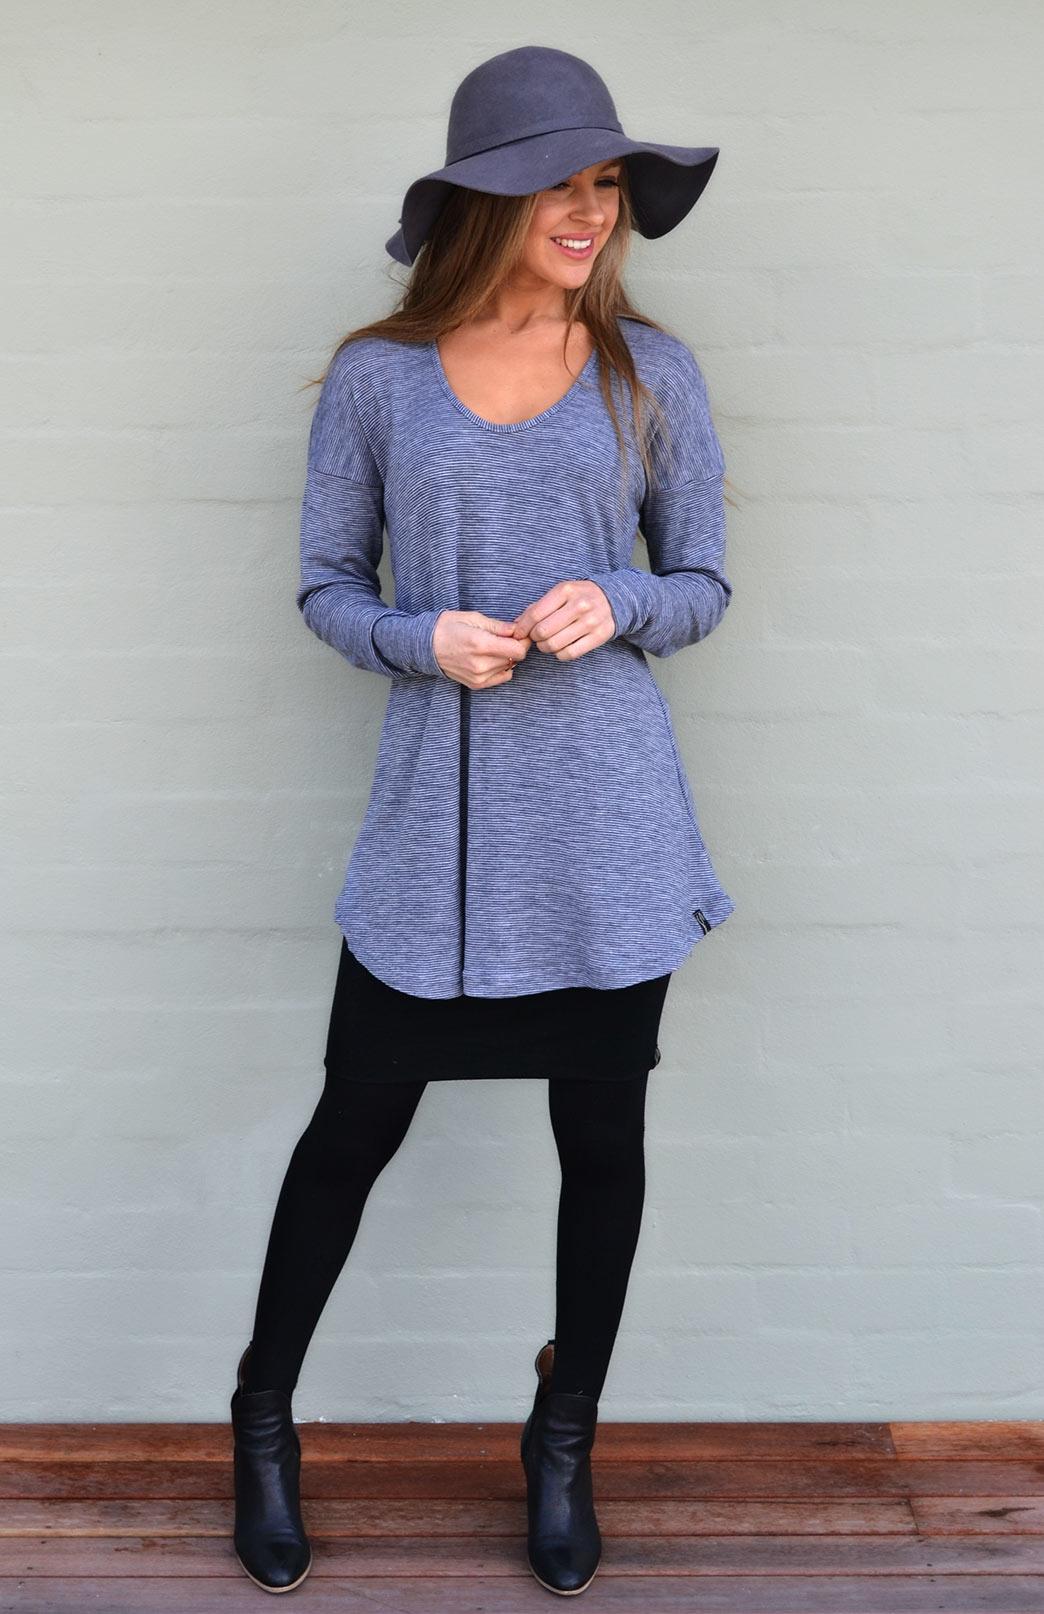 Wave Top - Women's Grey Pinstripe Relaxed Wool Top with dropped shoulders - Smitten Merino Tasmania Australia